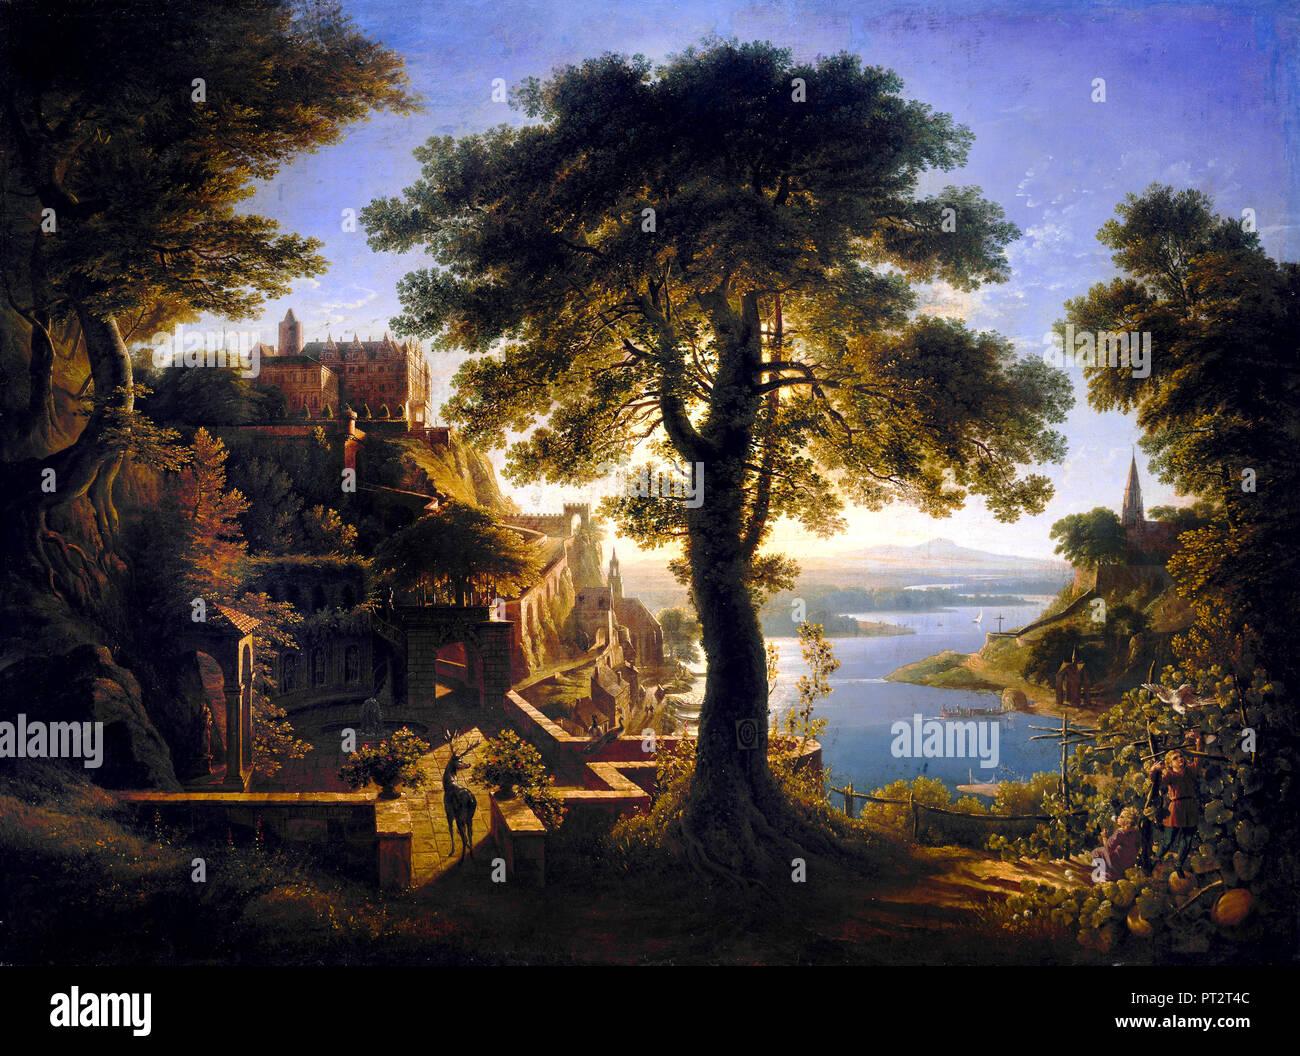 Karl Friedrich Schinkel, Castle by the River 1820 Oil on canvas, Alte Nationalgalerie, Berlin, Germany. - Stock Image